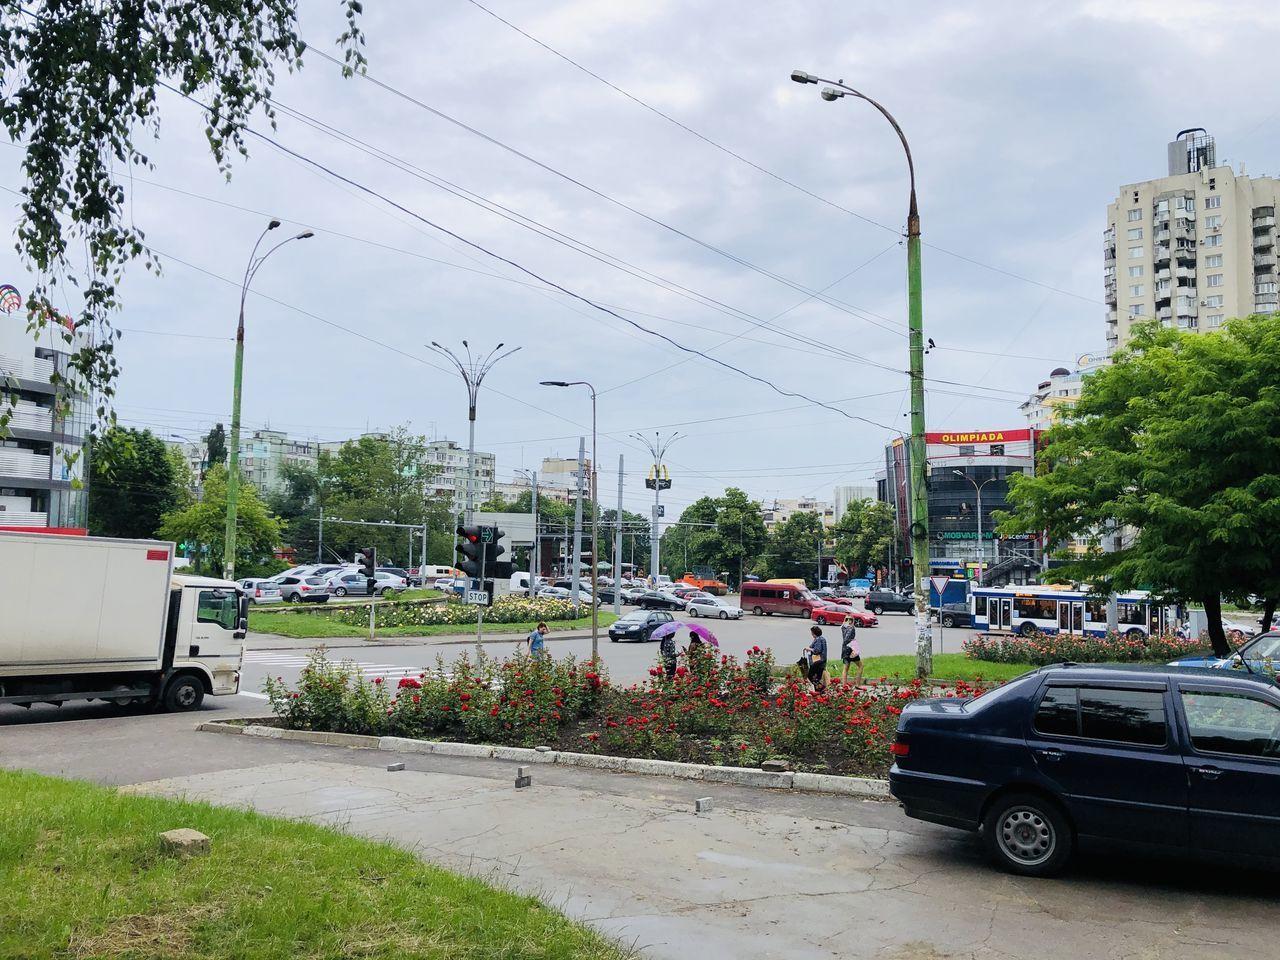 Chirie spațiu comercial amplasat prima linie bd.Traian intersecție bd. Dacia !!